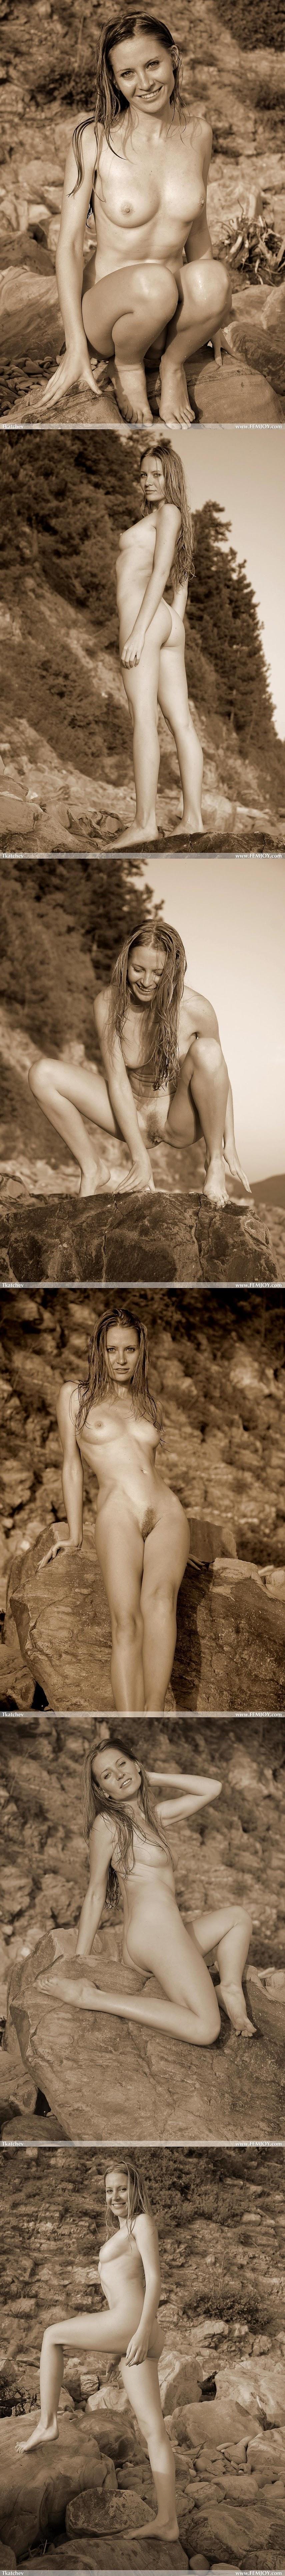 FEdf  - 2005-08-26 - Yanina - New Morning x60 3000pxReal Street Angels